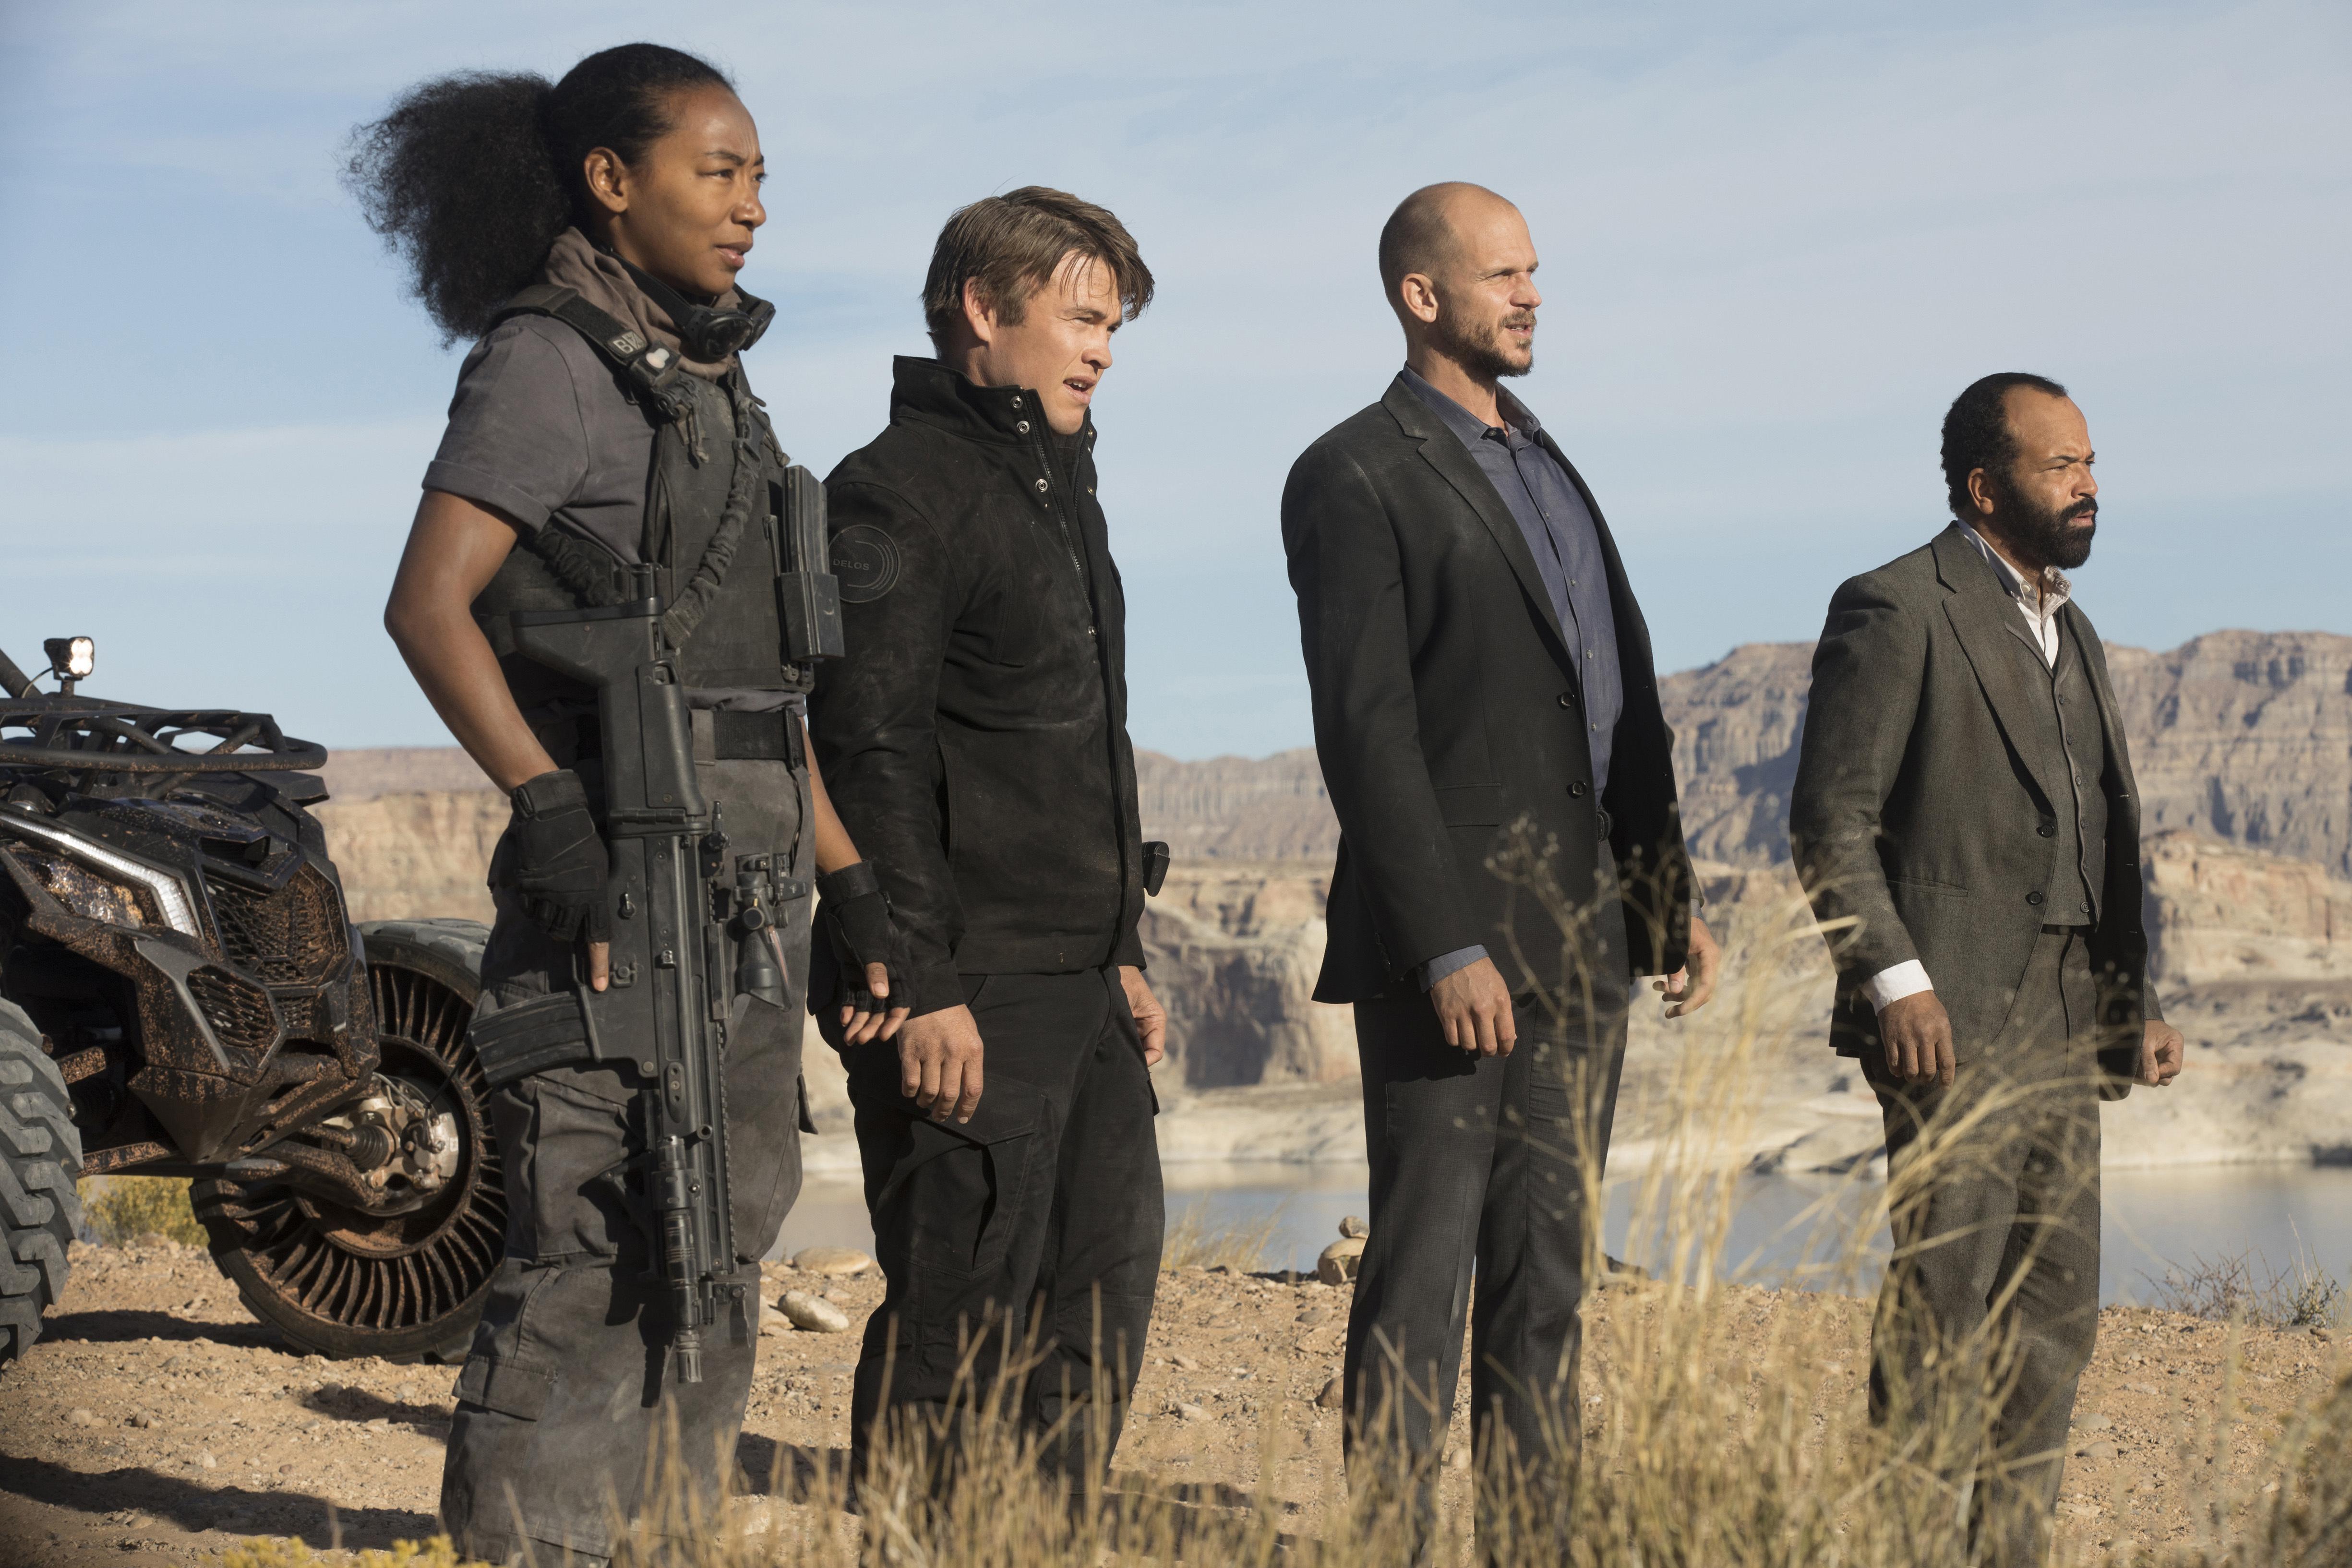 Photo by John P. Johnson/HBO